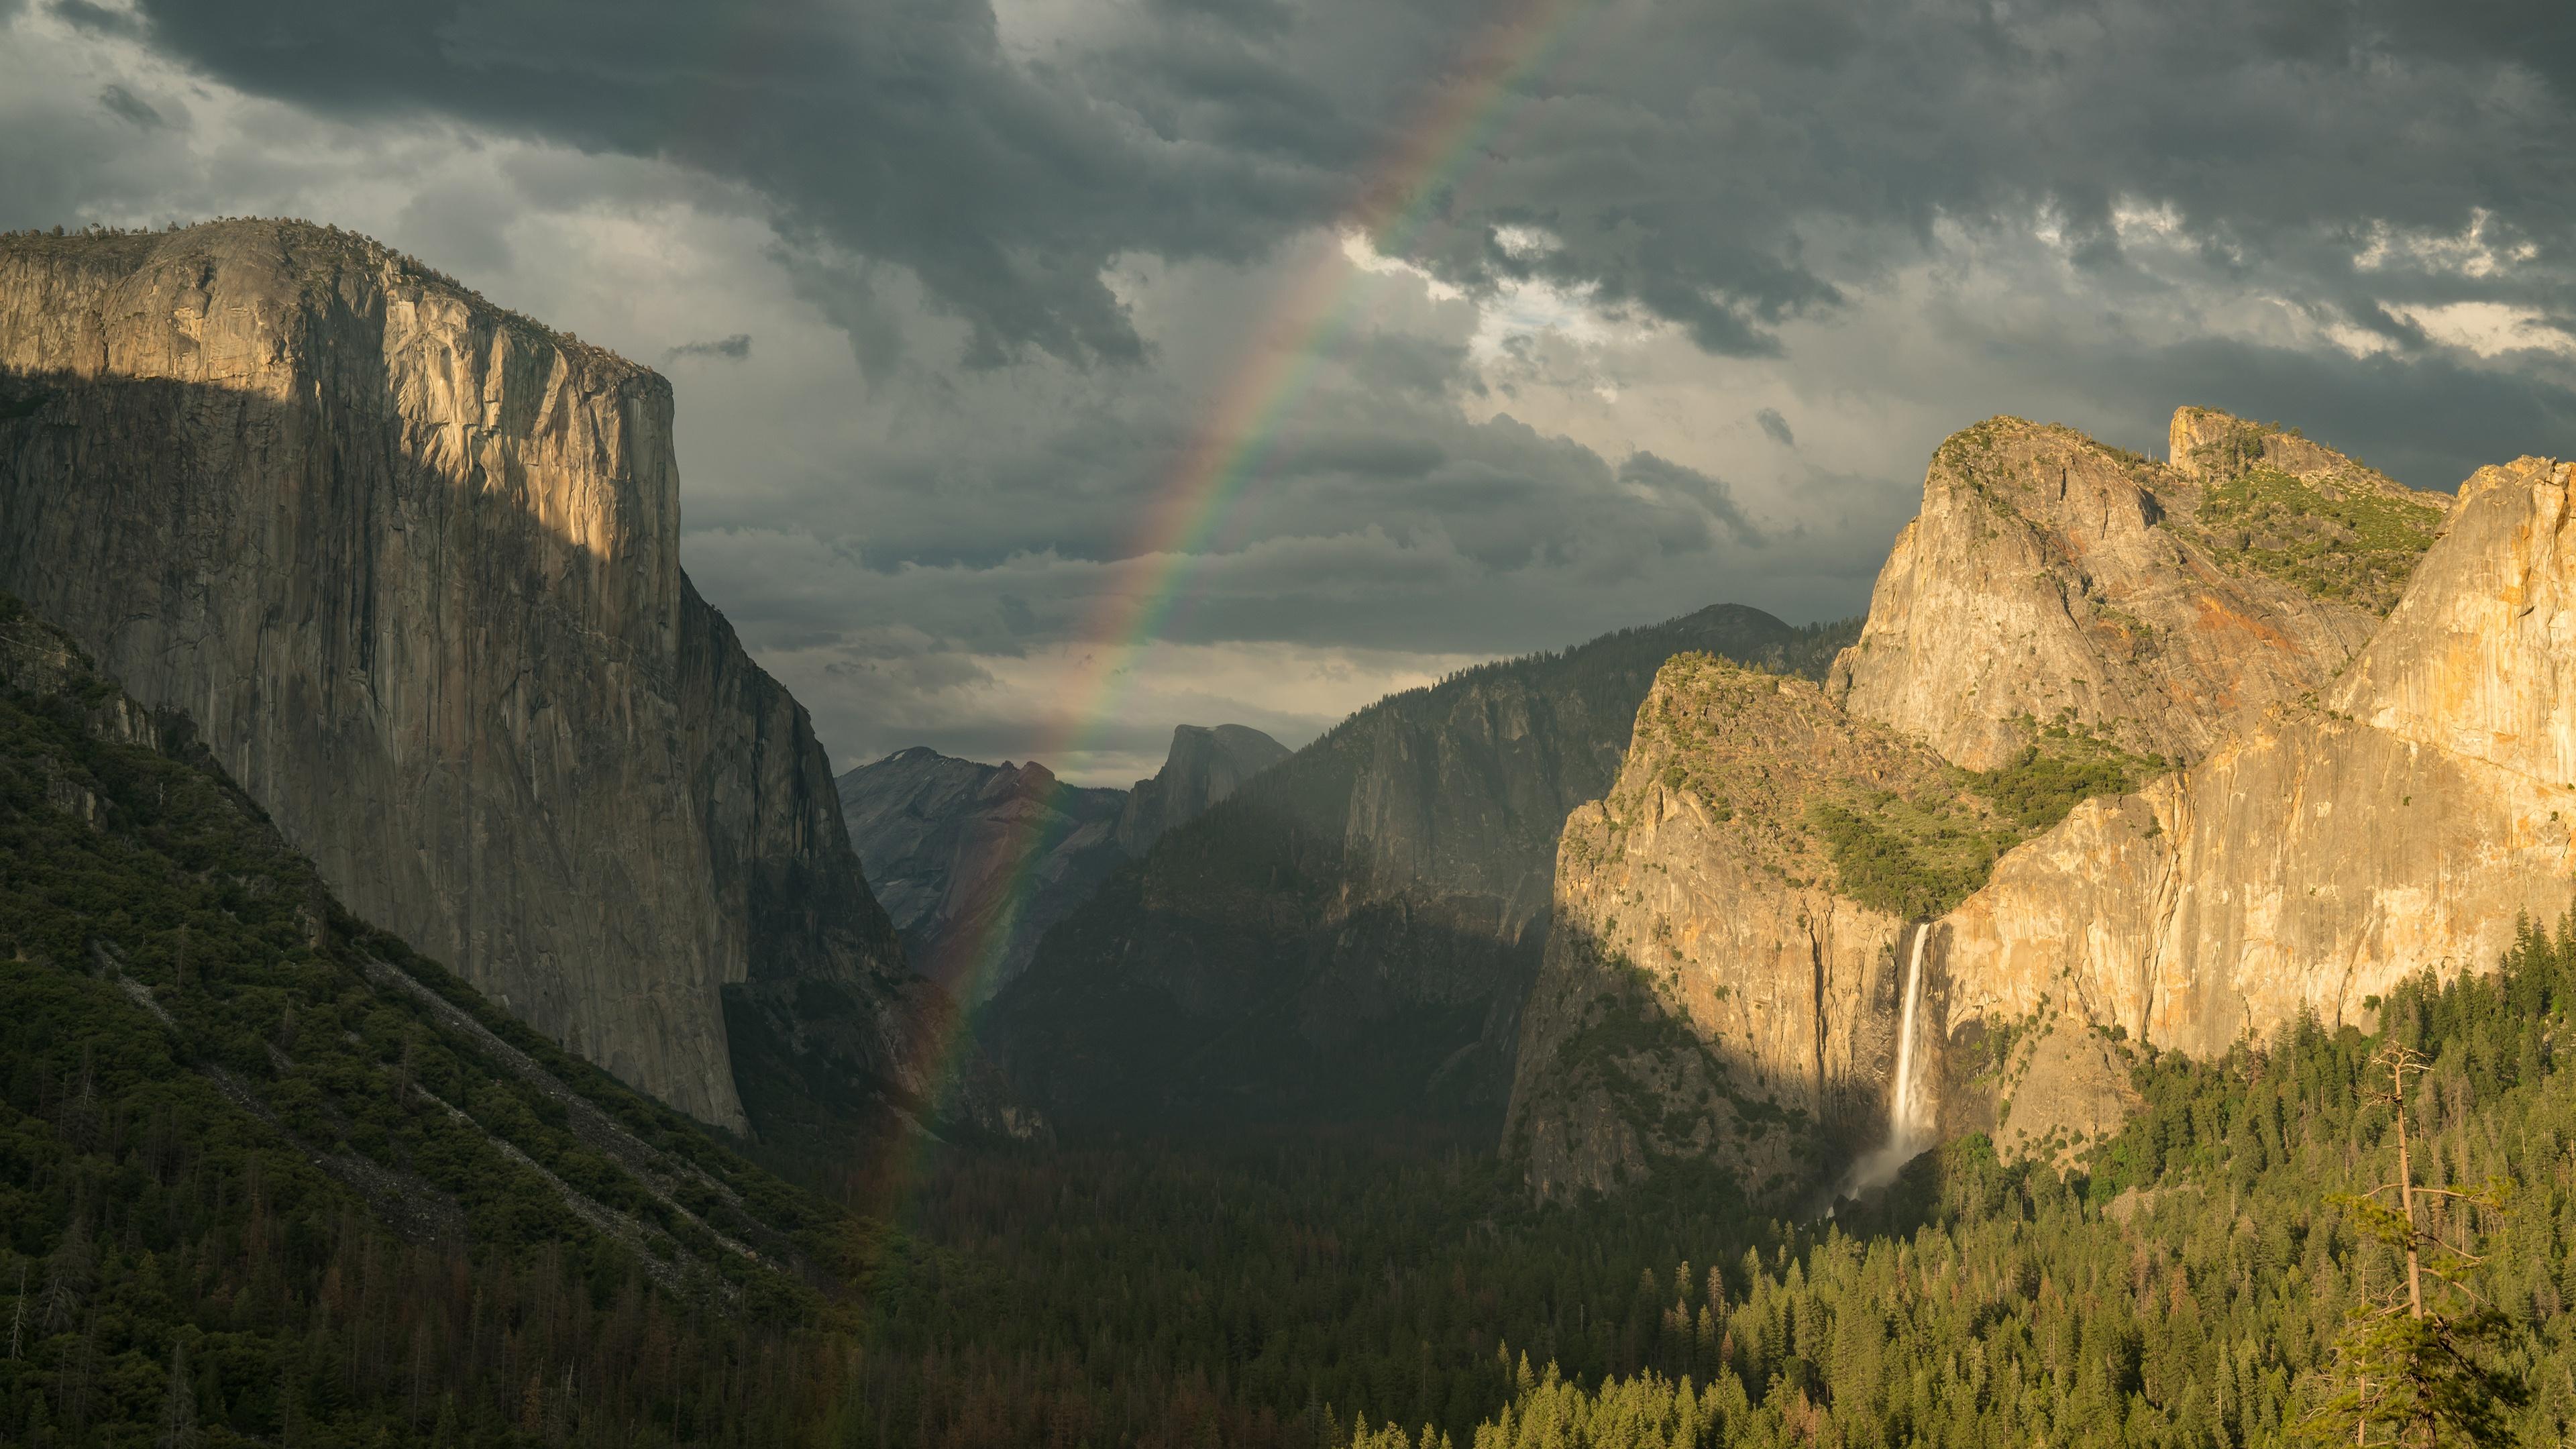 Rainbow Waterfall Mountain Cliff 3840x2160